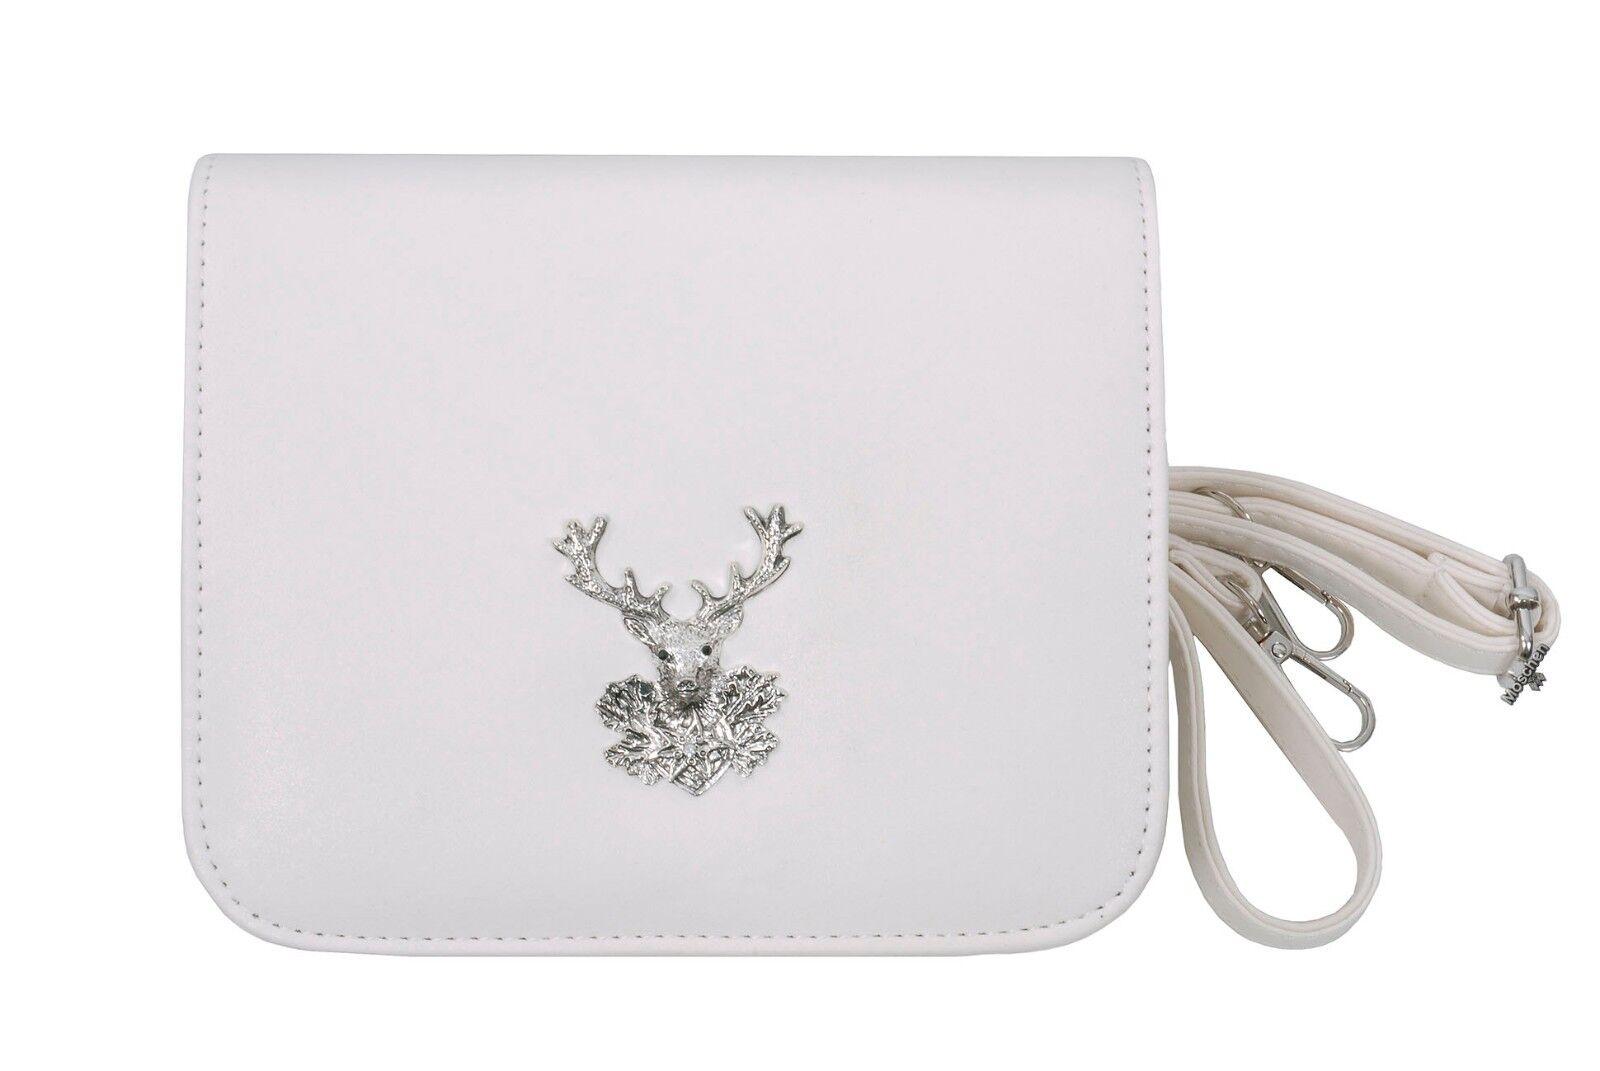 Trachtentasche Dirndltasche Dirndltasche Dirndltasche Damentasche Handtasche Umhängetasche Leder Creme | Günstigen Preis  | Export  | Große Klassifizierung  3c4712